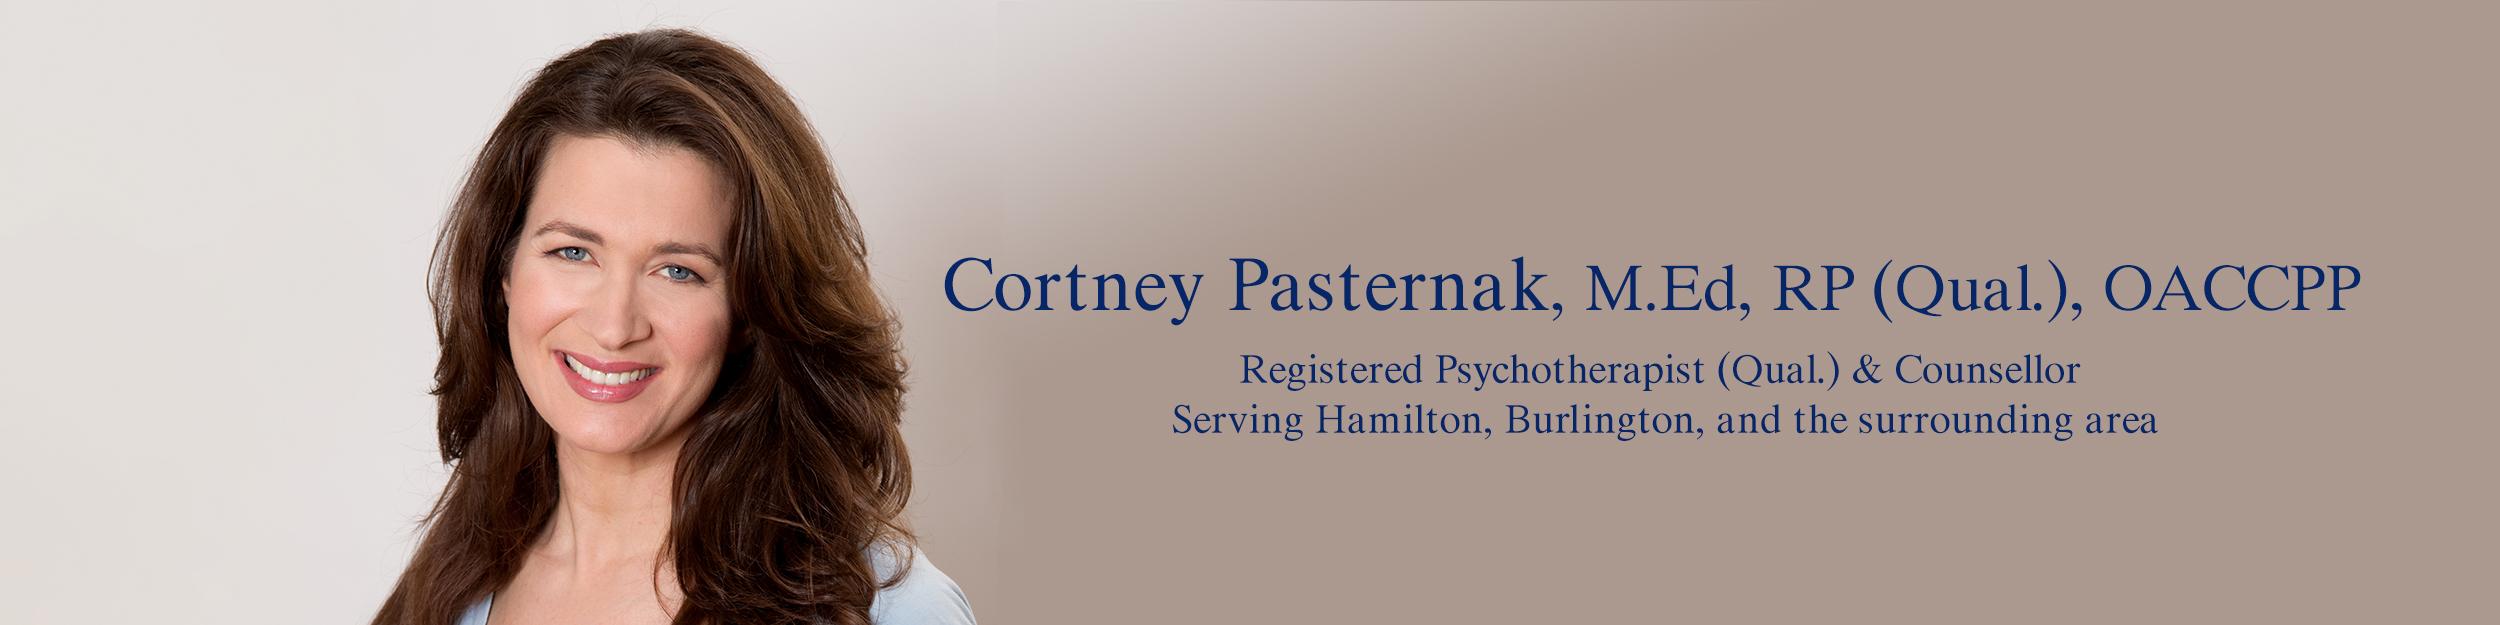 Cortney Pasternak,  Counsellor